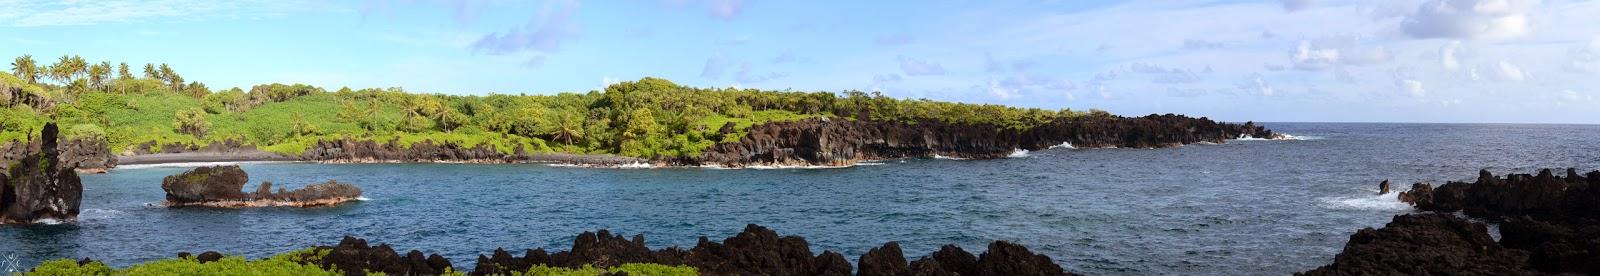 Wai'ānapanapa State Park (Black Sand beach) - Maui, Hawaii - Hawaï